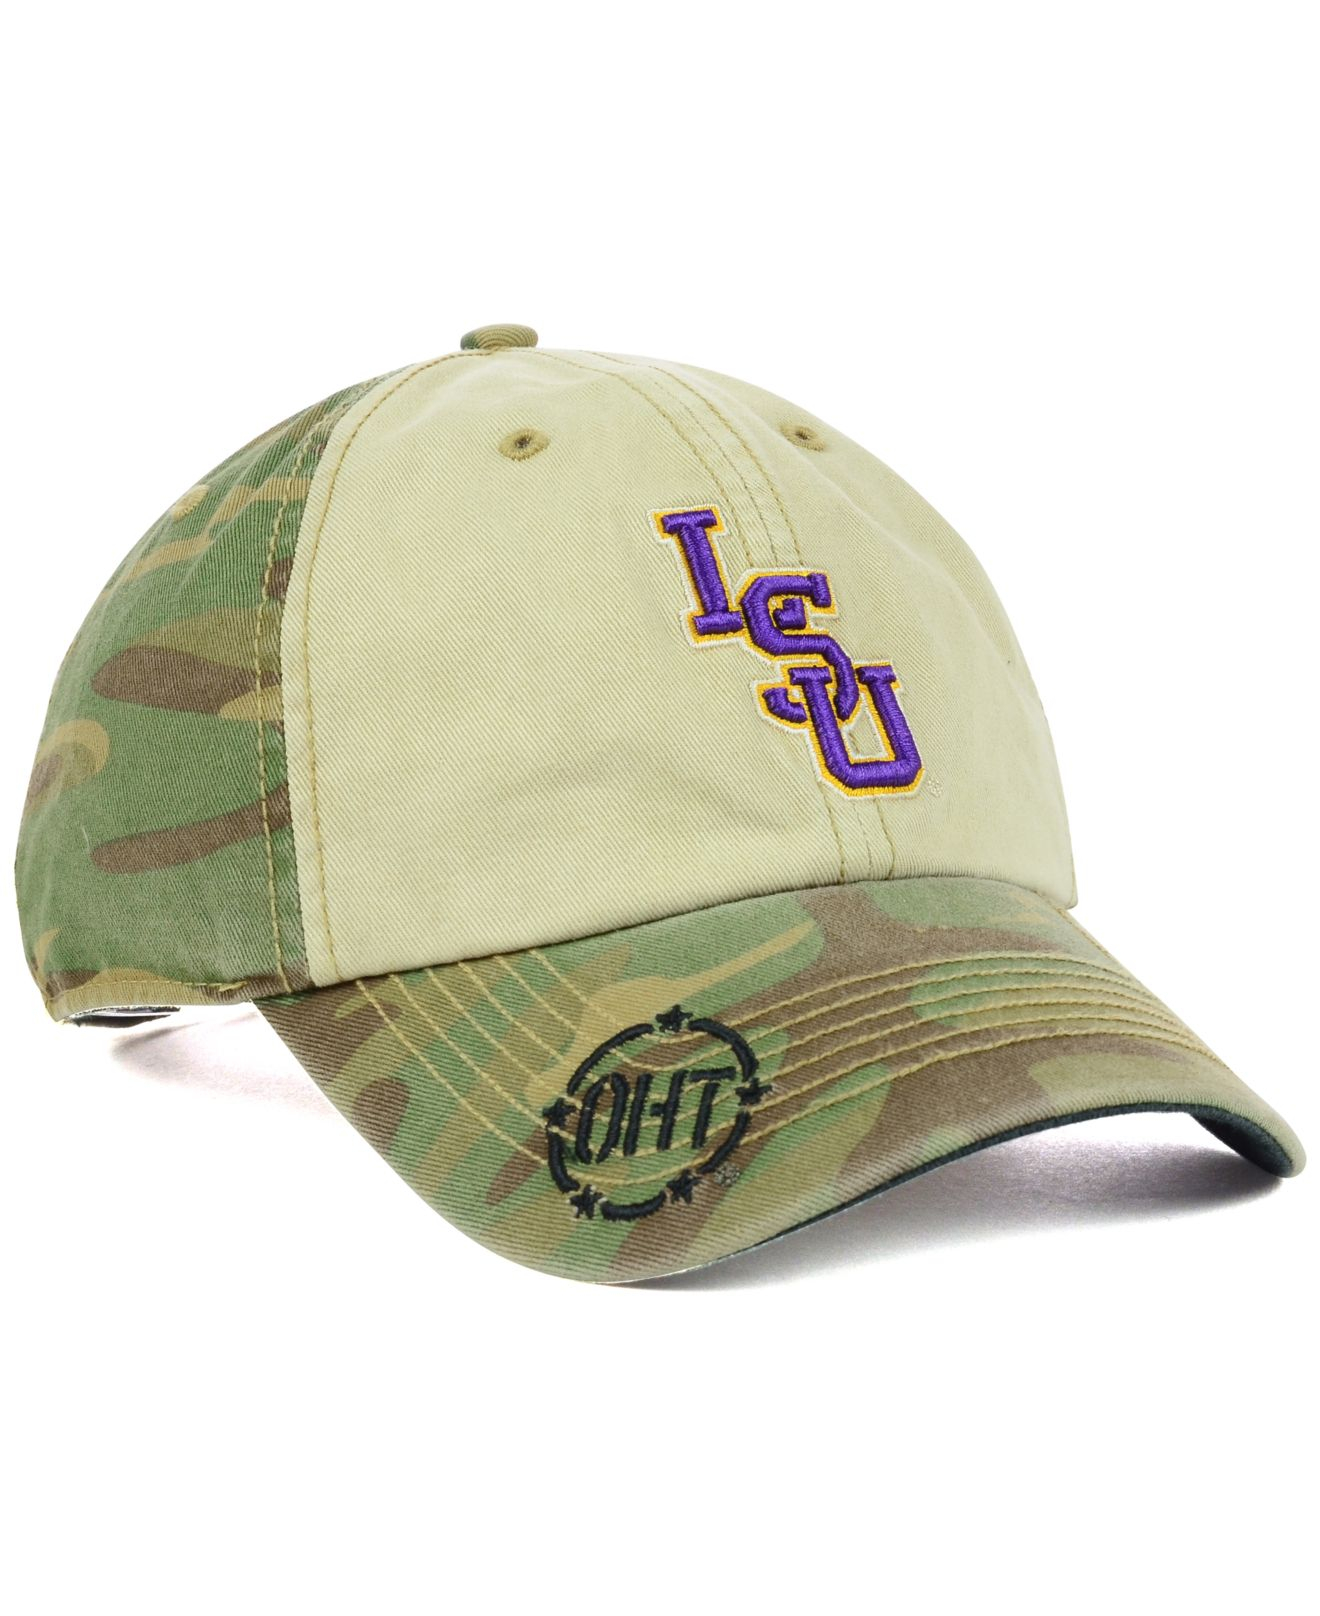 best service 40741 2556b ... ireland lyst 47 brand lsu tigers oht gordie clean up cap in green for  men b1a1d